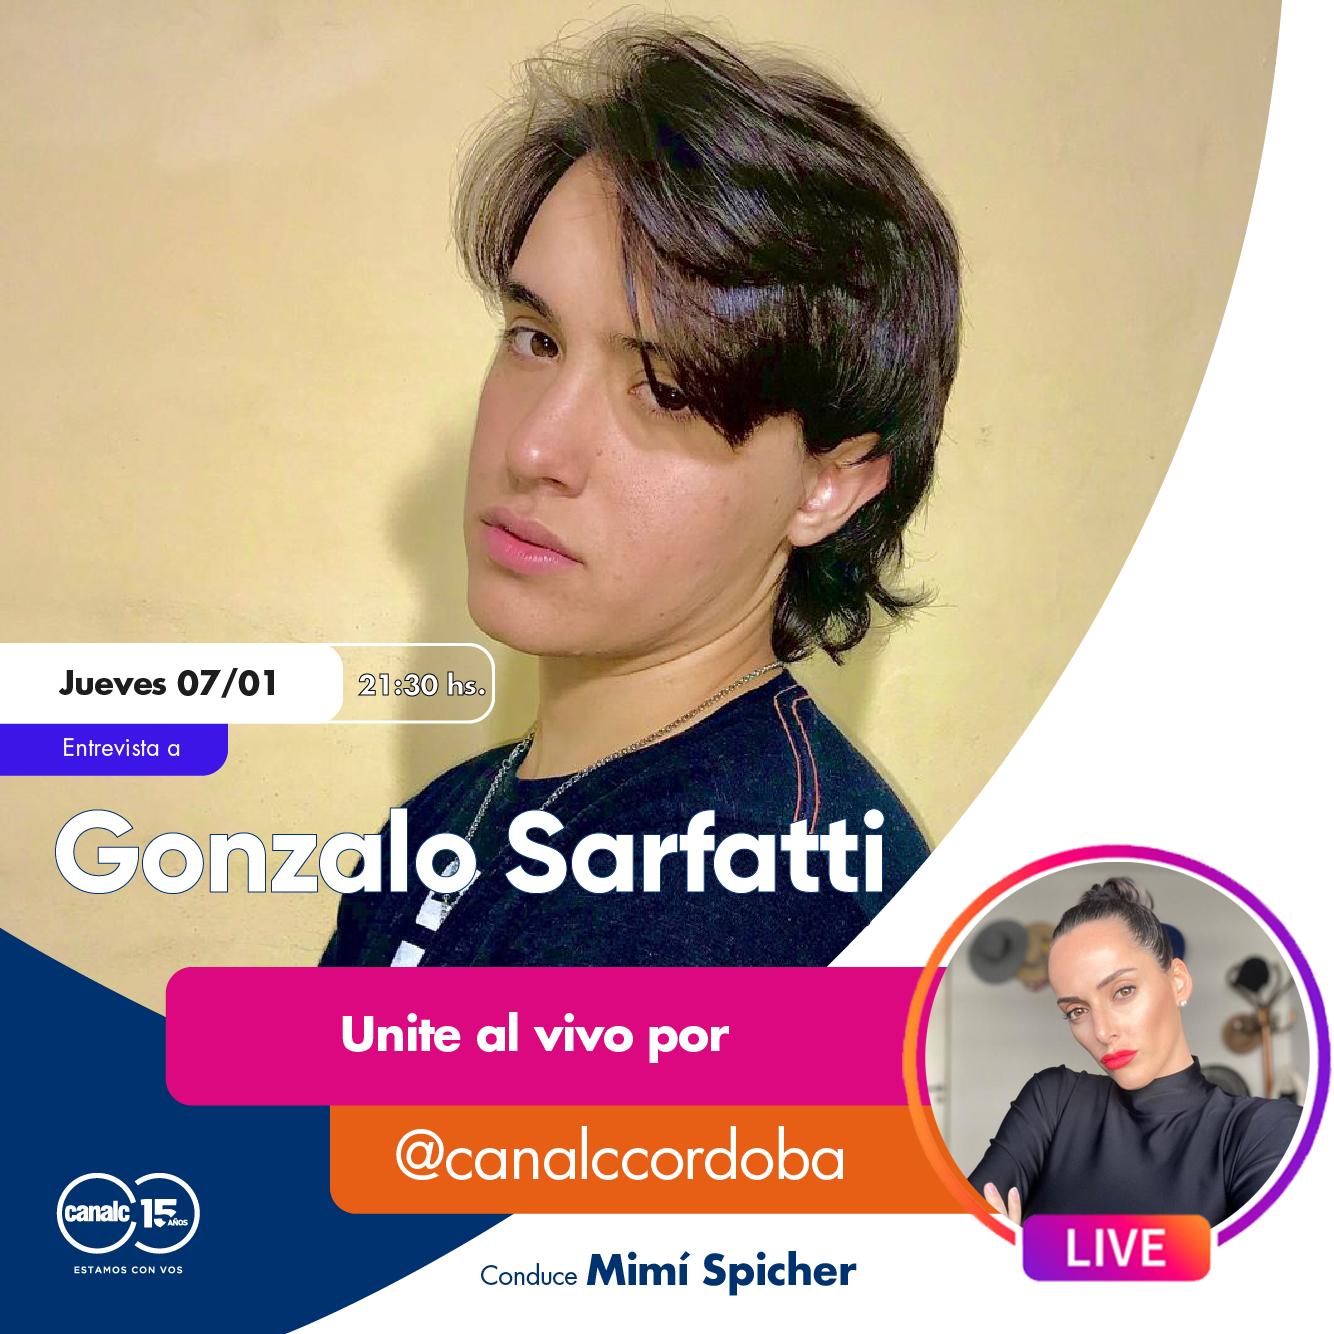 Este jueves, viví el Instagram Live de Mimí Spicher con Gonzalo Sarfatti • Canal C